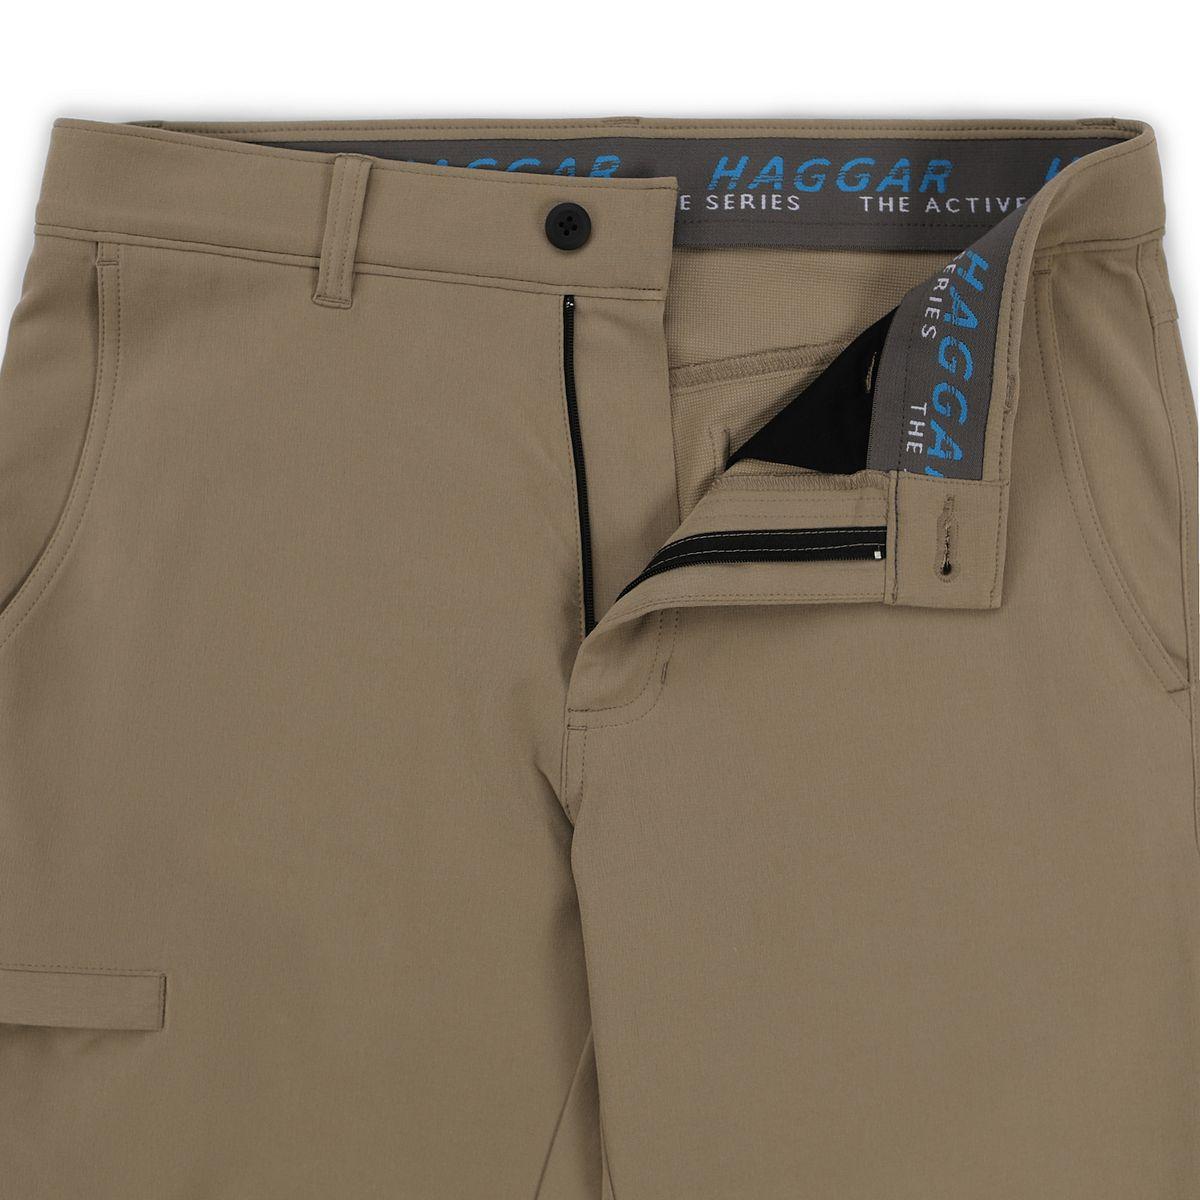 Men's Haggar® Active Series Slim-Straight Fit Flat-Front Urban Pants Black SRikr